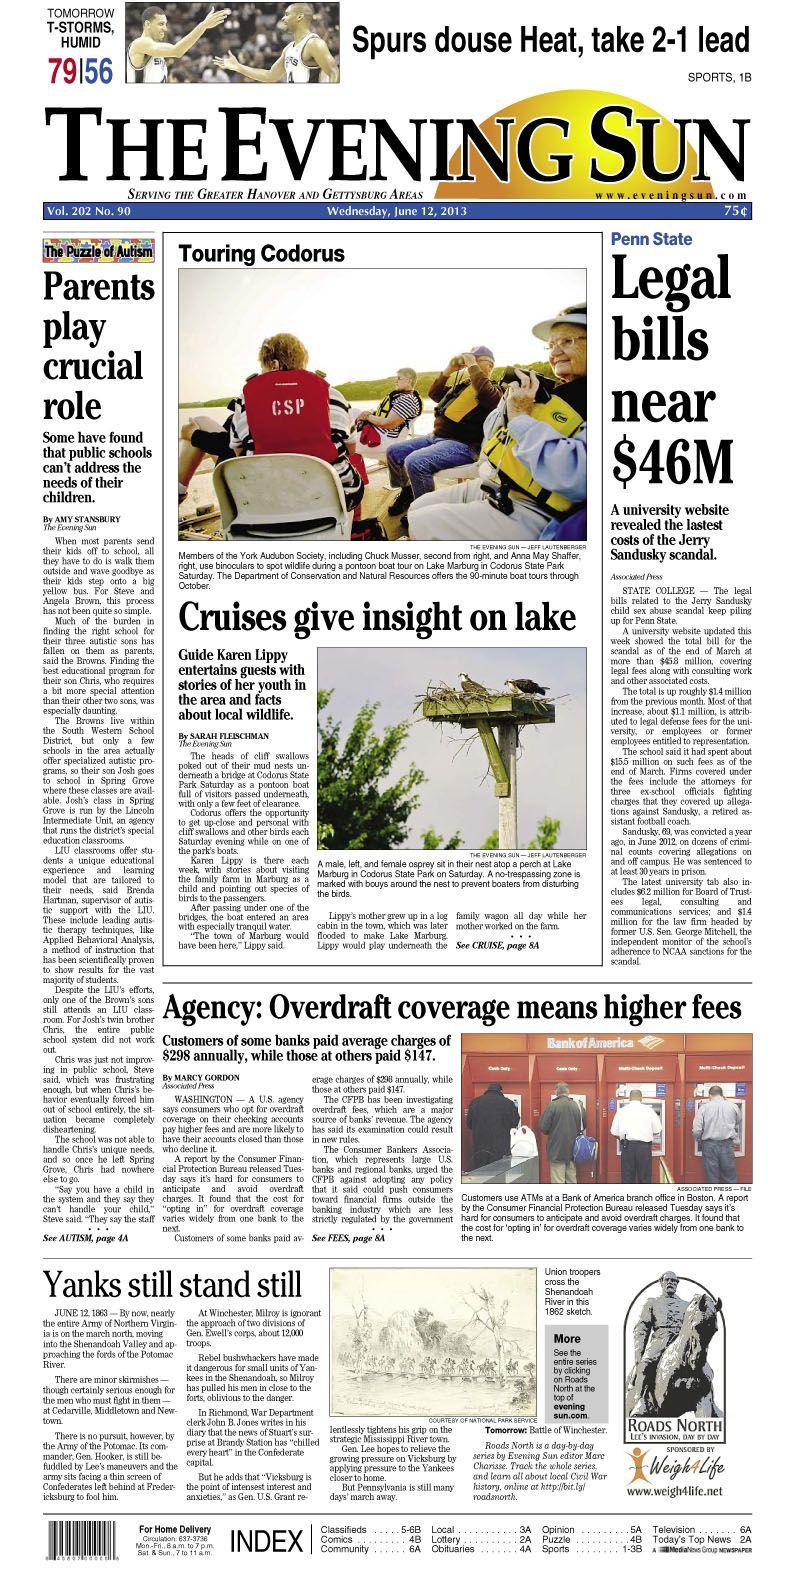 The Evening Sun, Wednesday, June 12, 2013